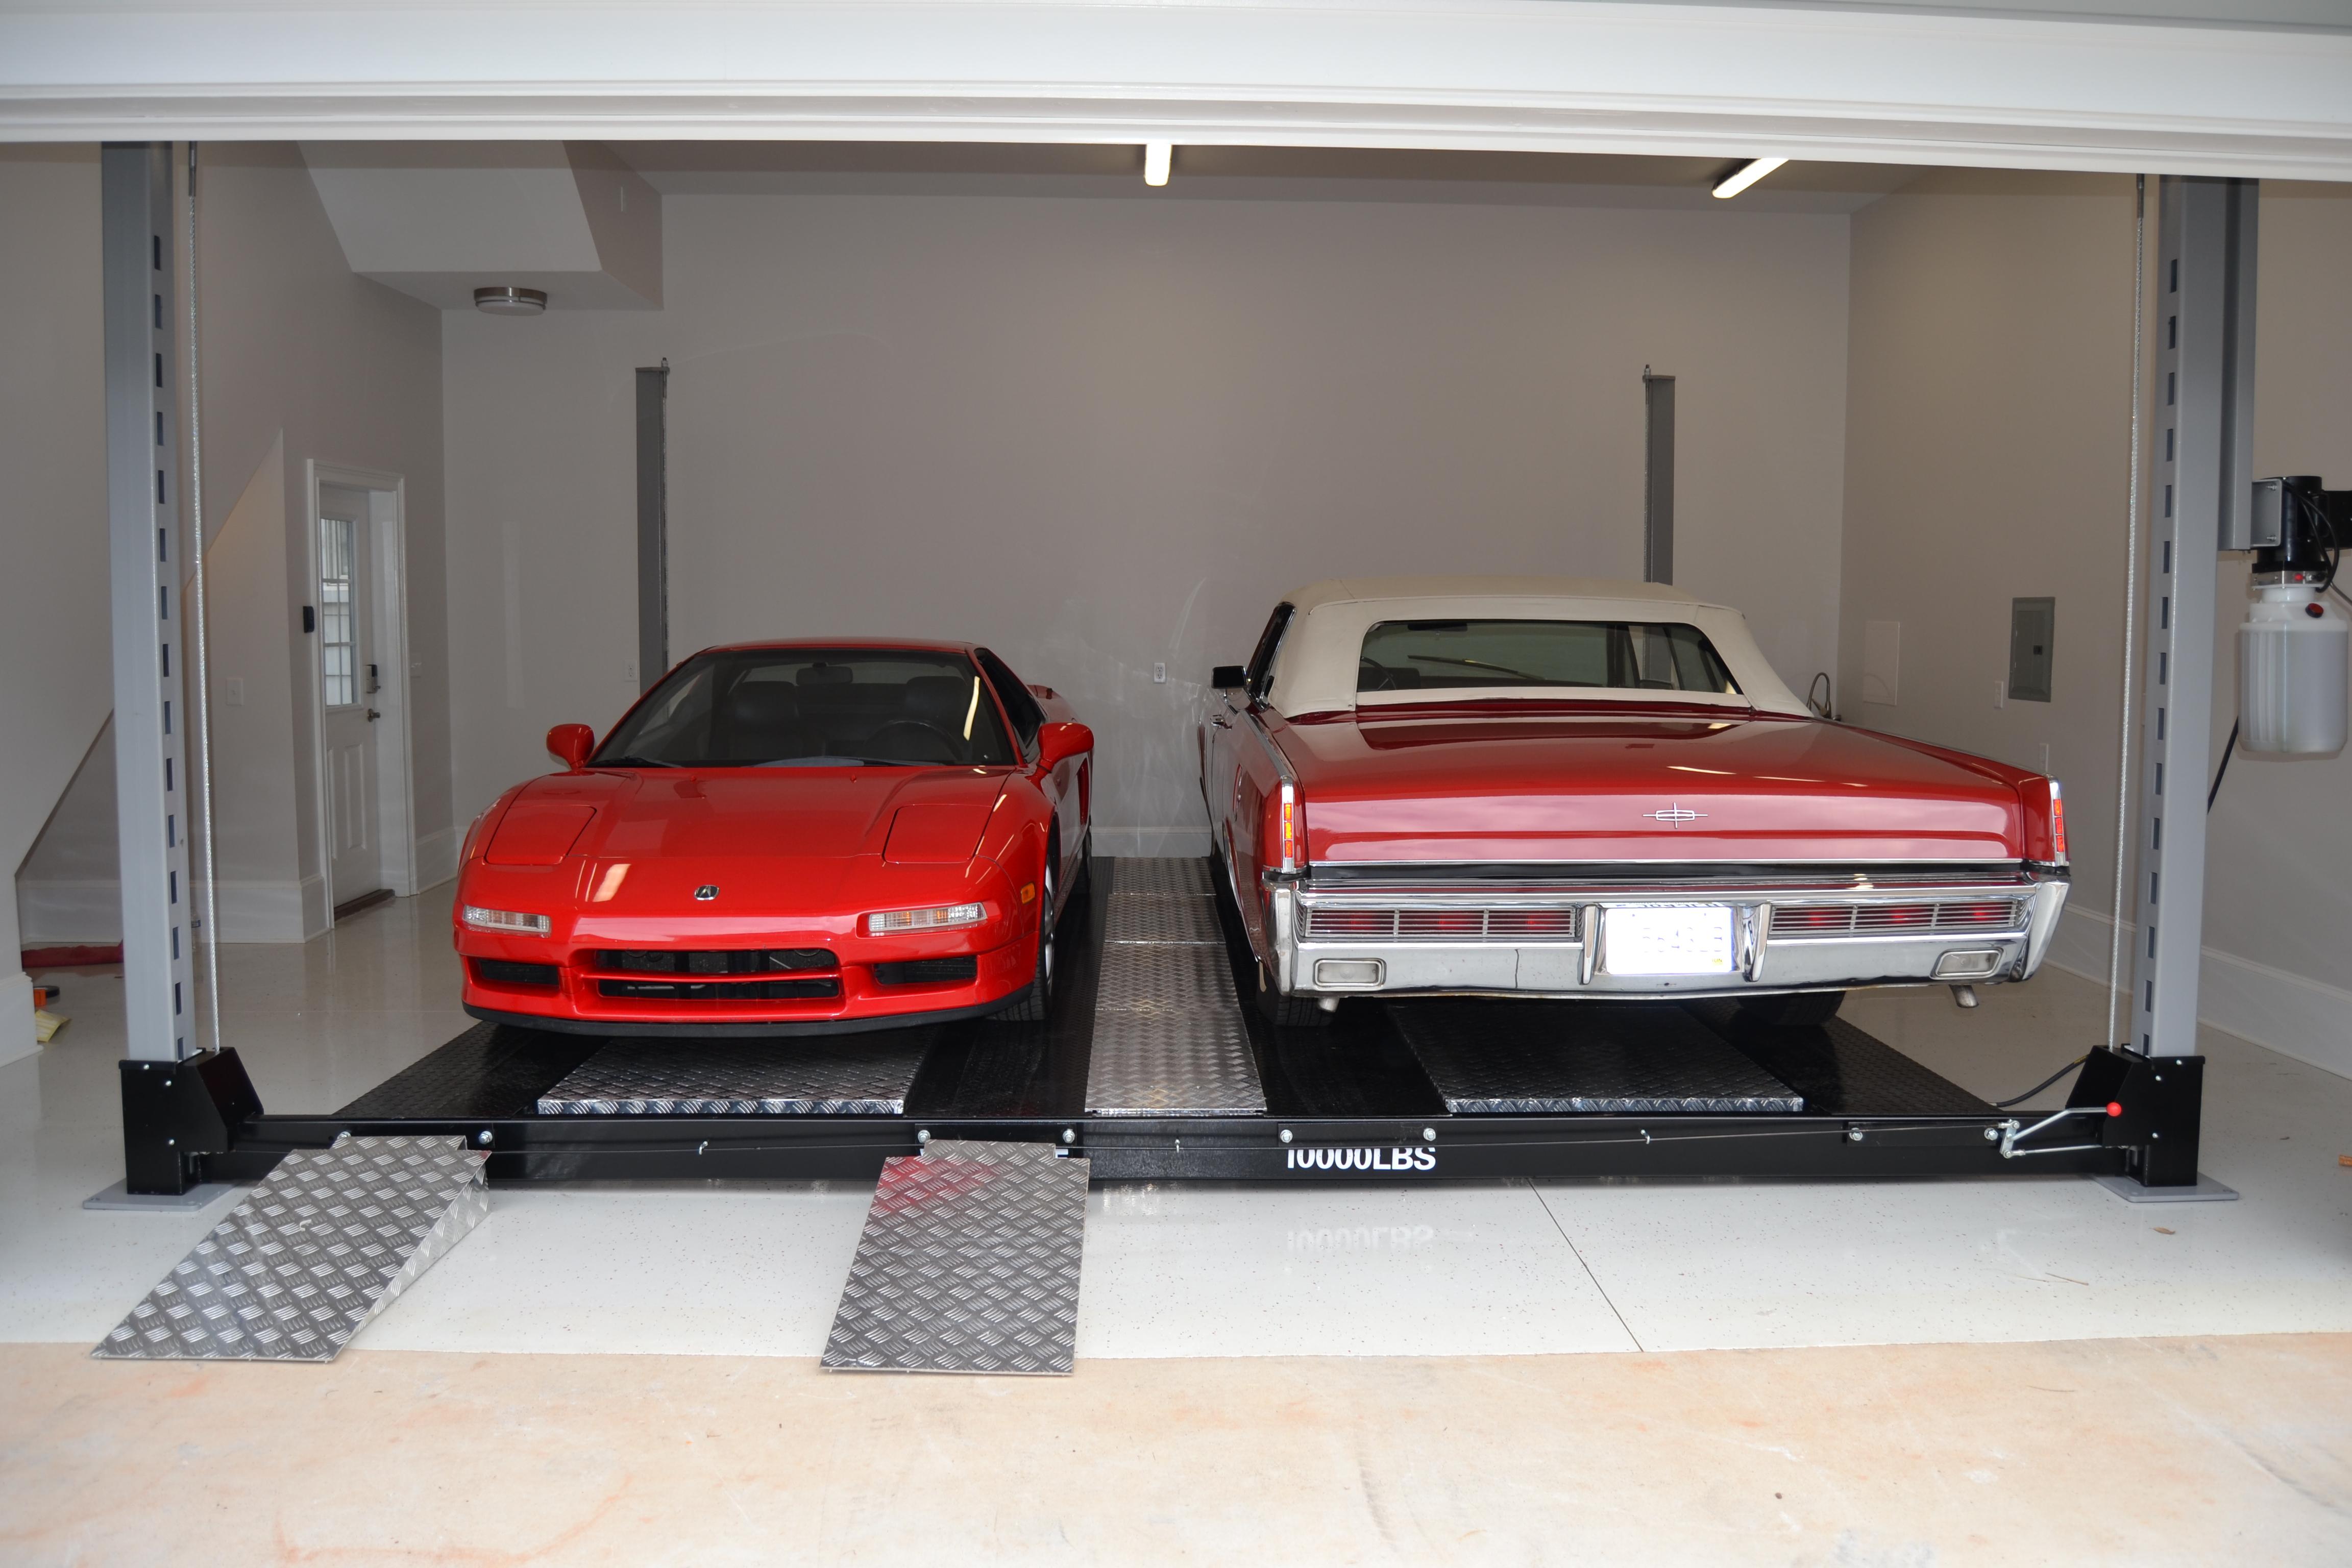 2 Cars Loaded